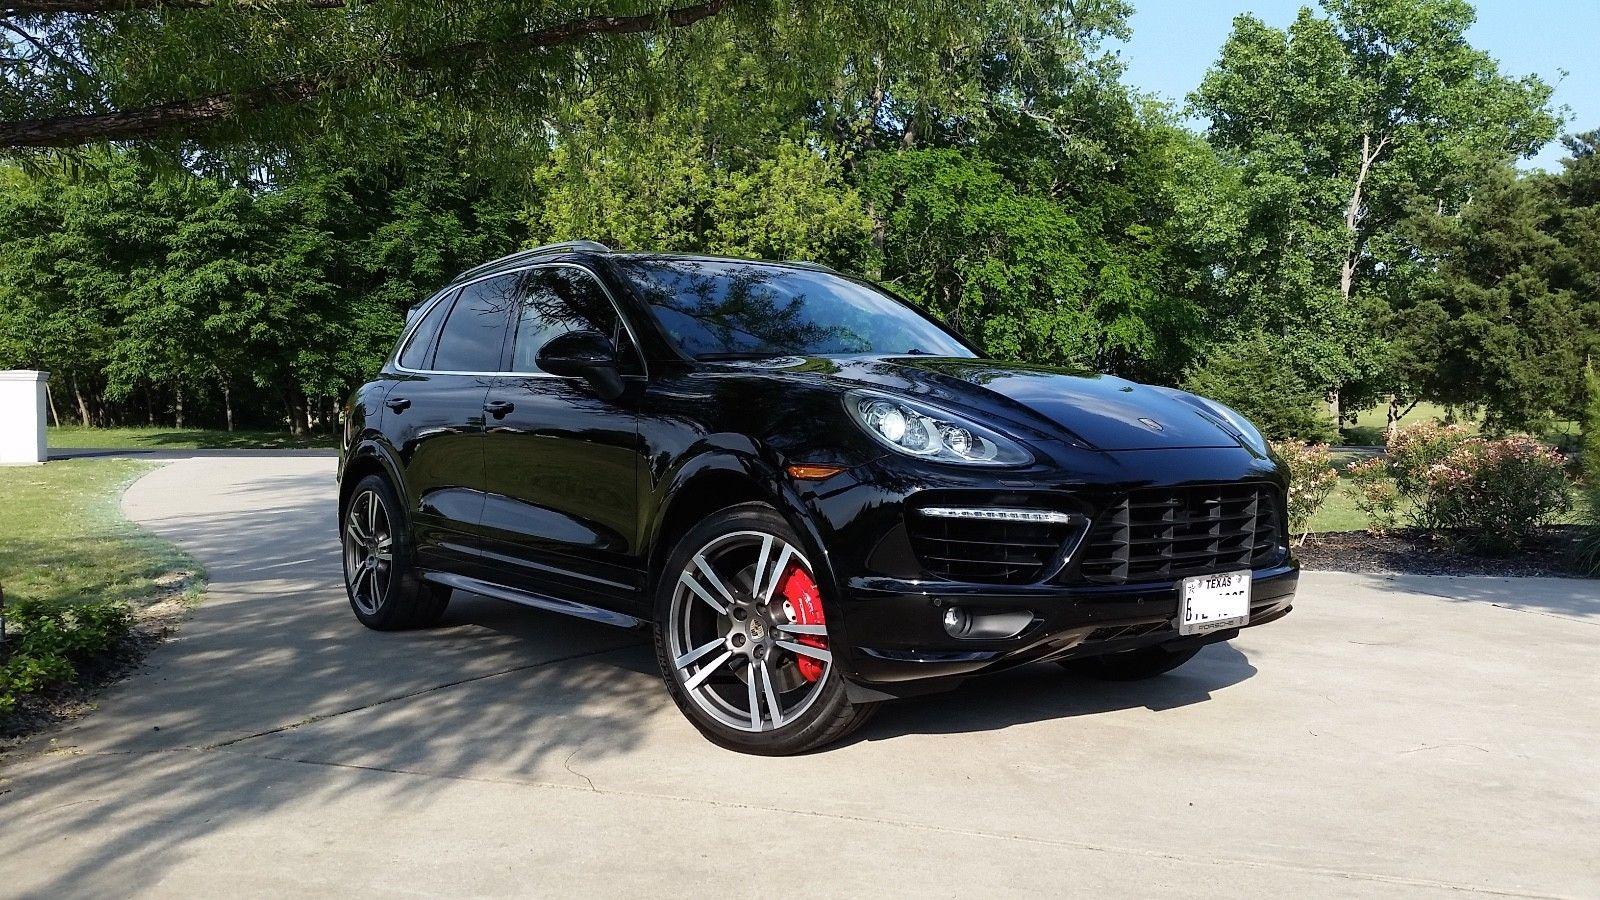 Used 2012 Porsche Cayenne Turbo 2012 Porsche Cayenne Twin Turbo 81 875 Miles Black Suv 4 8l 8cyl 2018 2019 24carshop Com